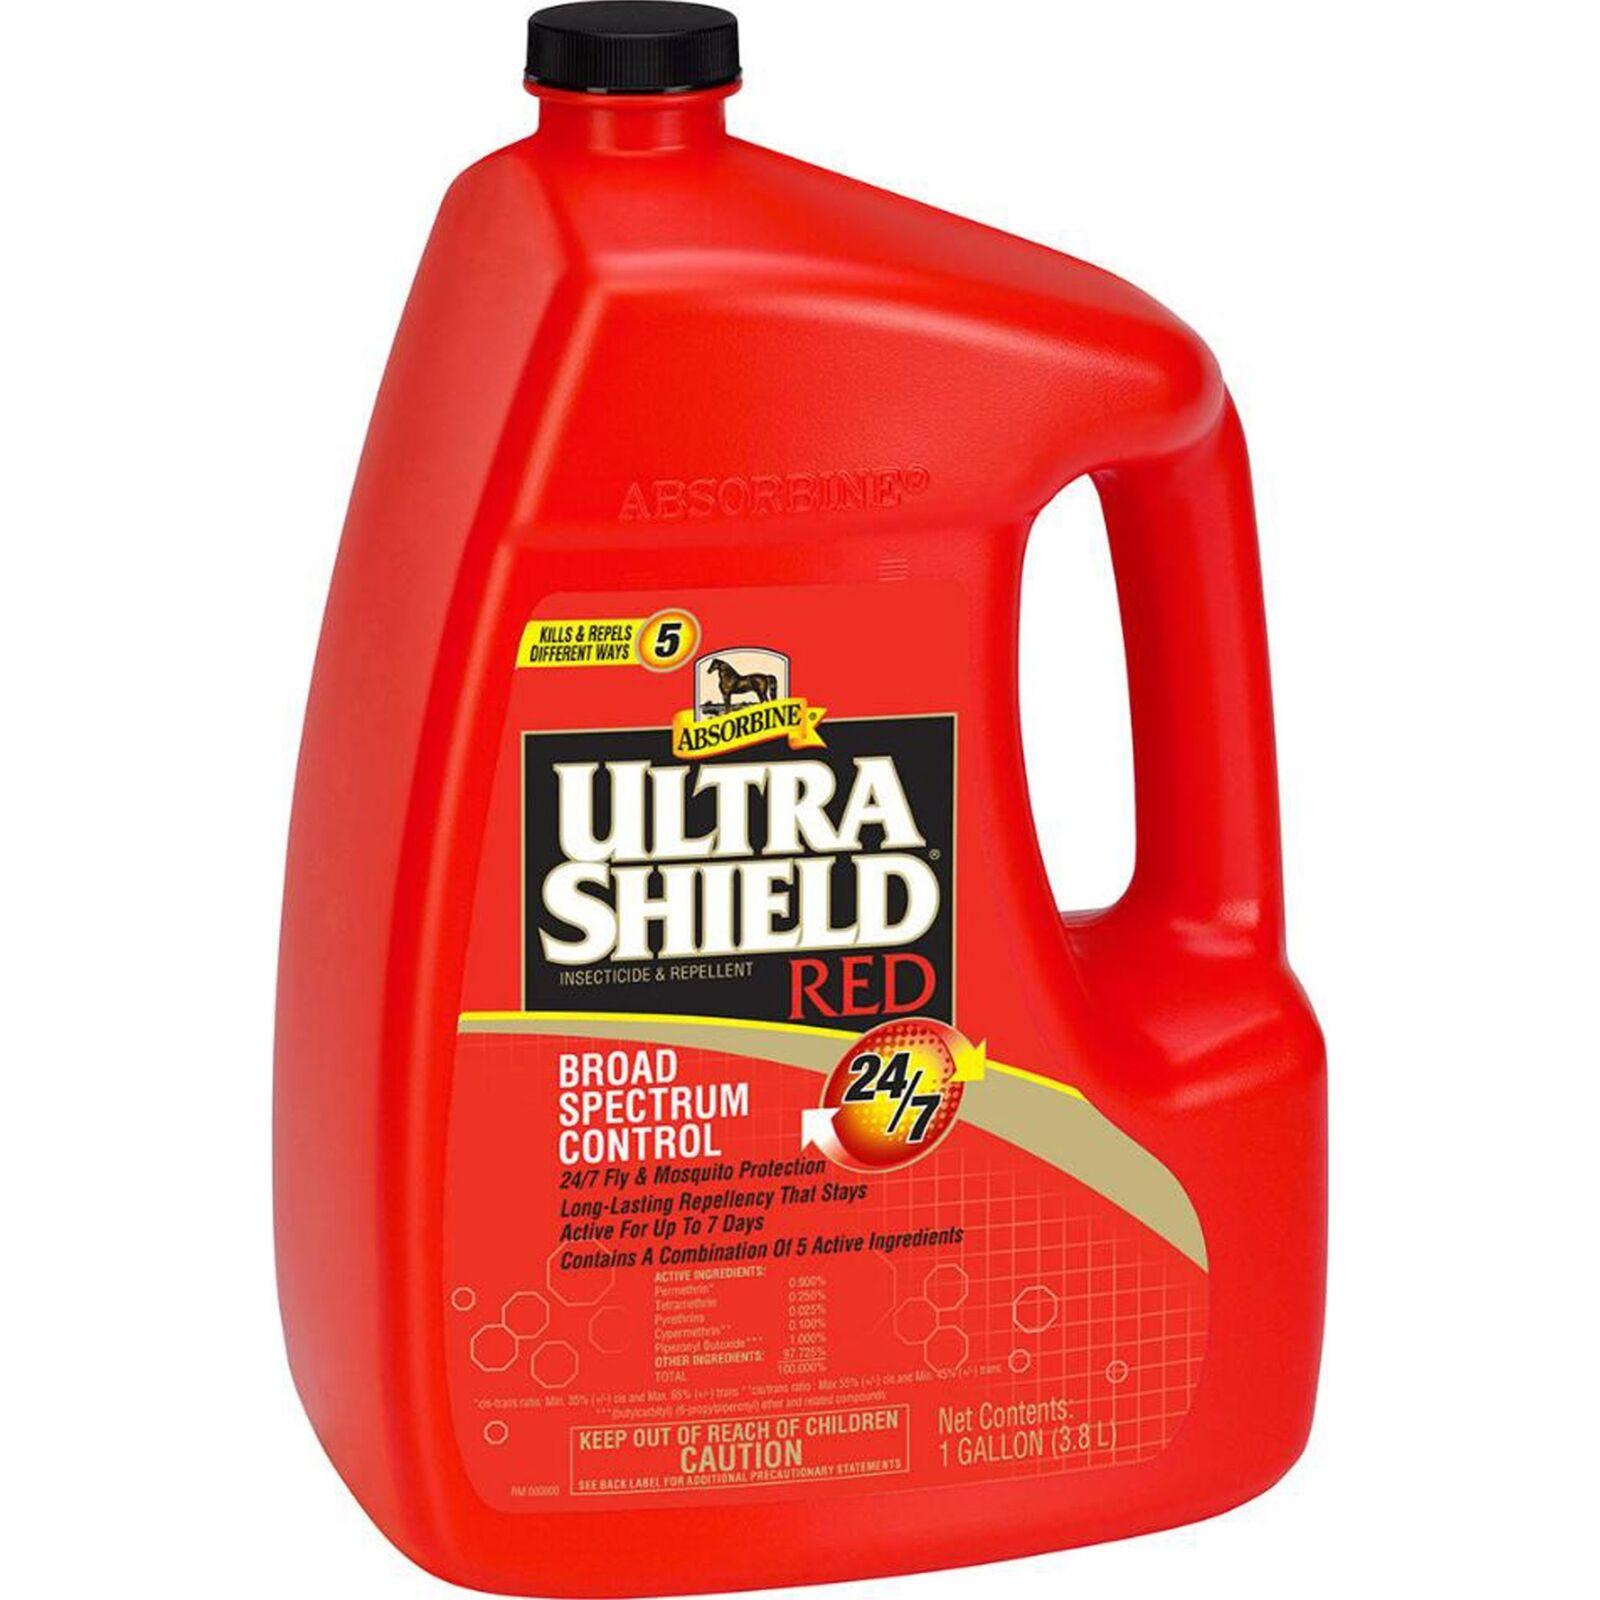 Absorbine Ultrashield Rojo insecticida & Repelente